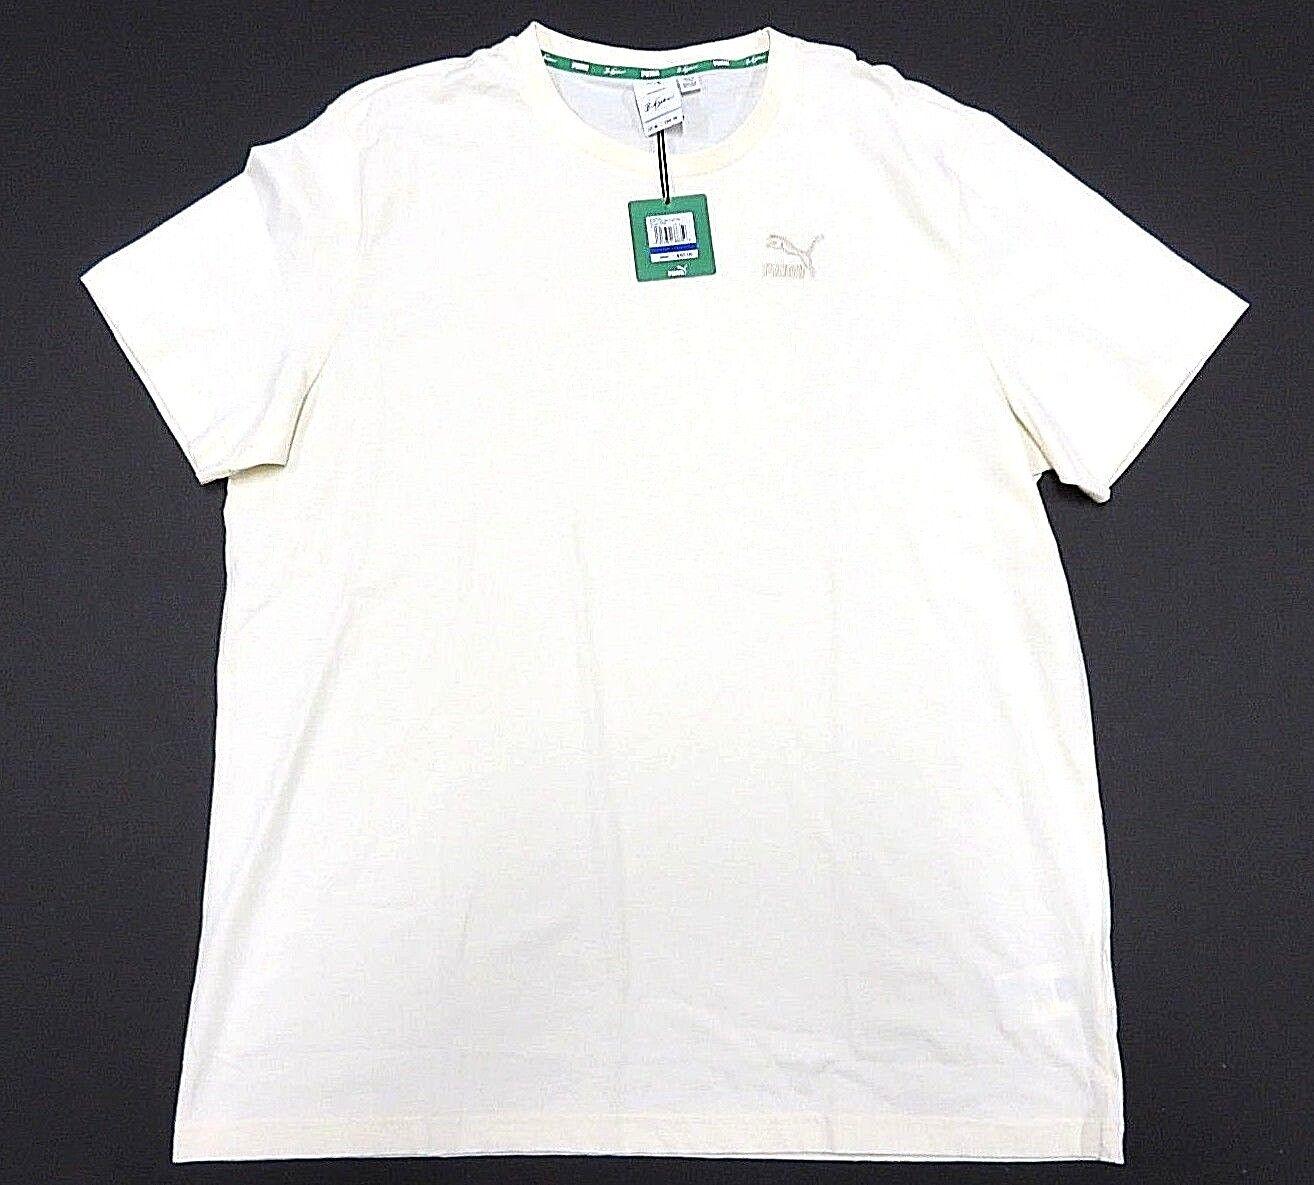 470d7f9c31 NWT PUMA x BIG SEAN Whisper White Graphic Short Sleeve Men's Size X ...